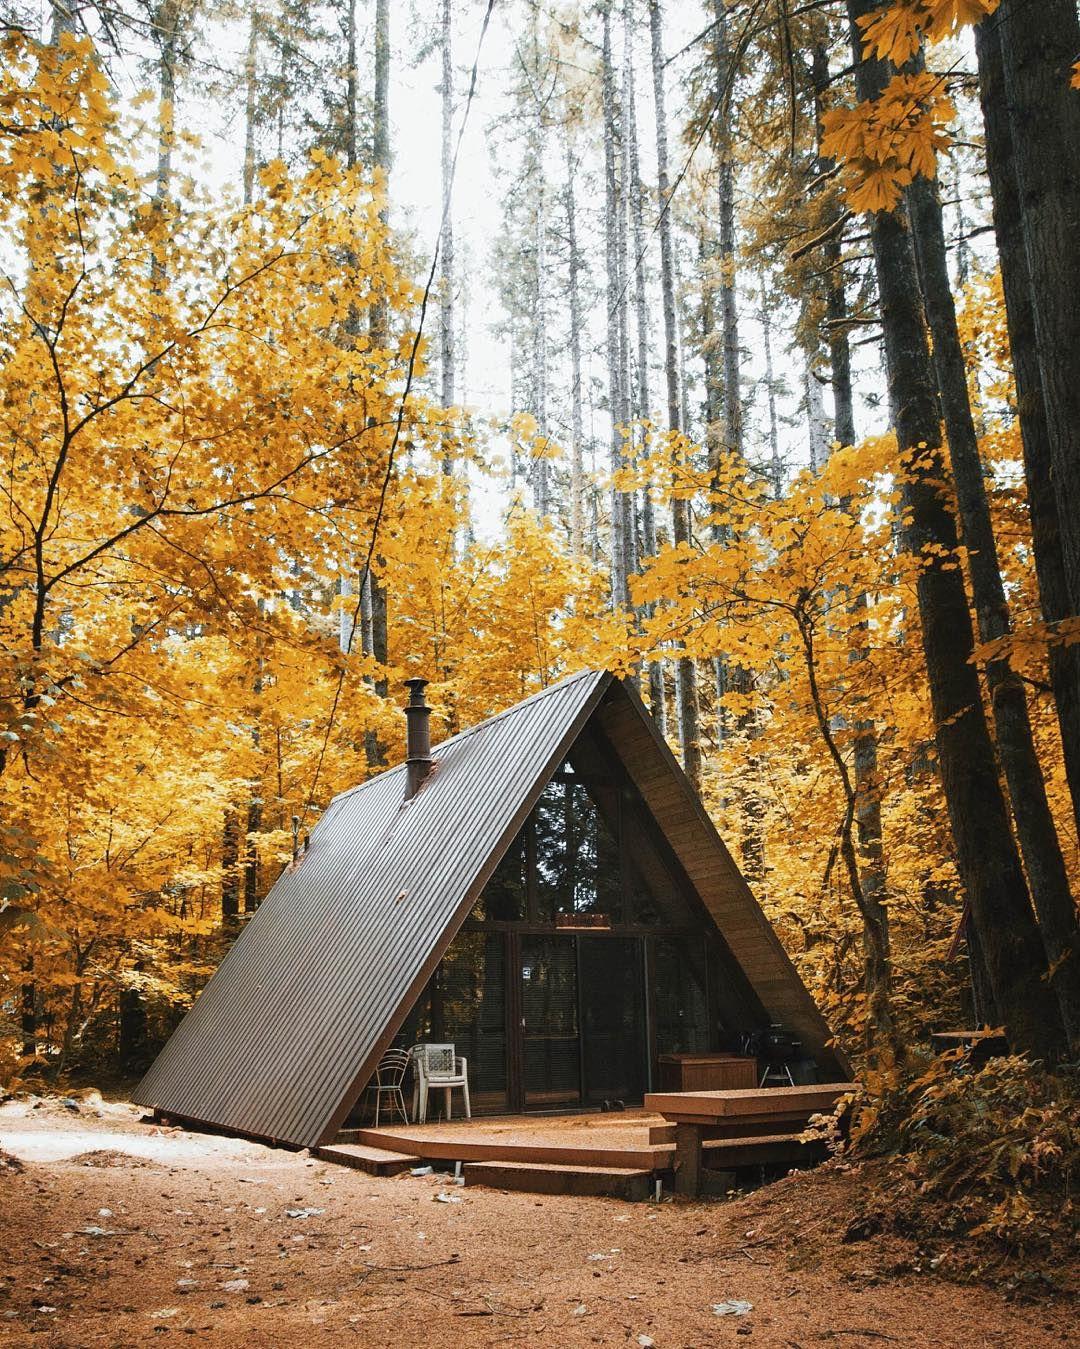 Building A Backyard Fence: Best 25+ Building A Small Cabin Ideas On Pinterest